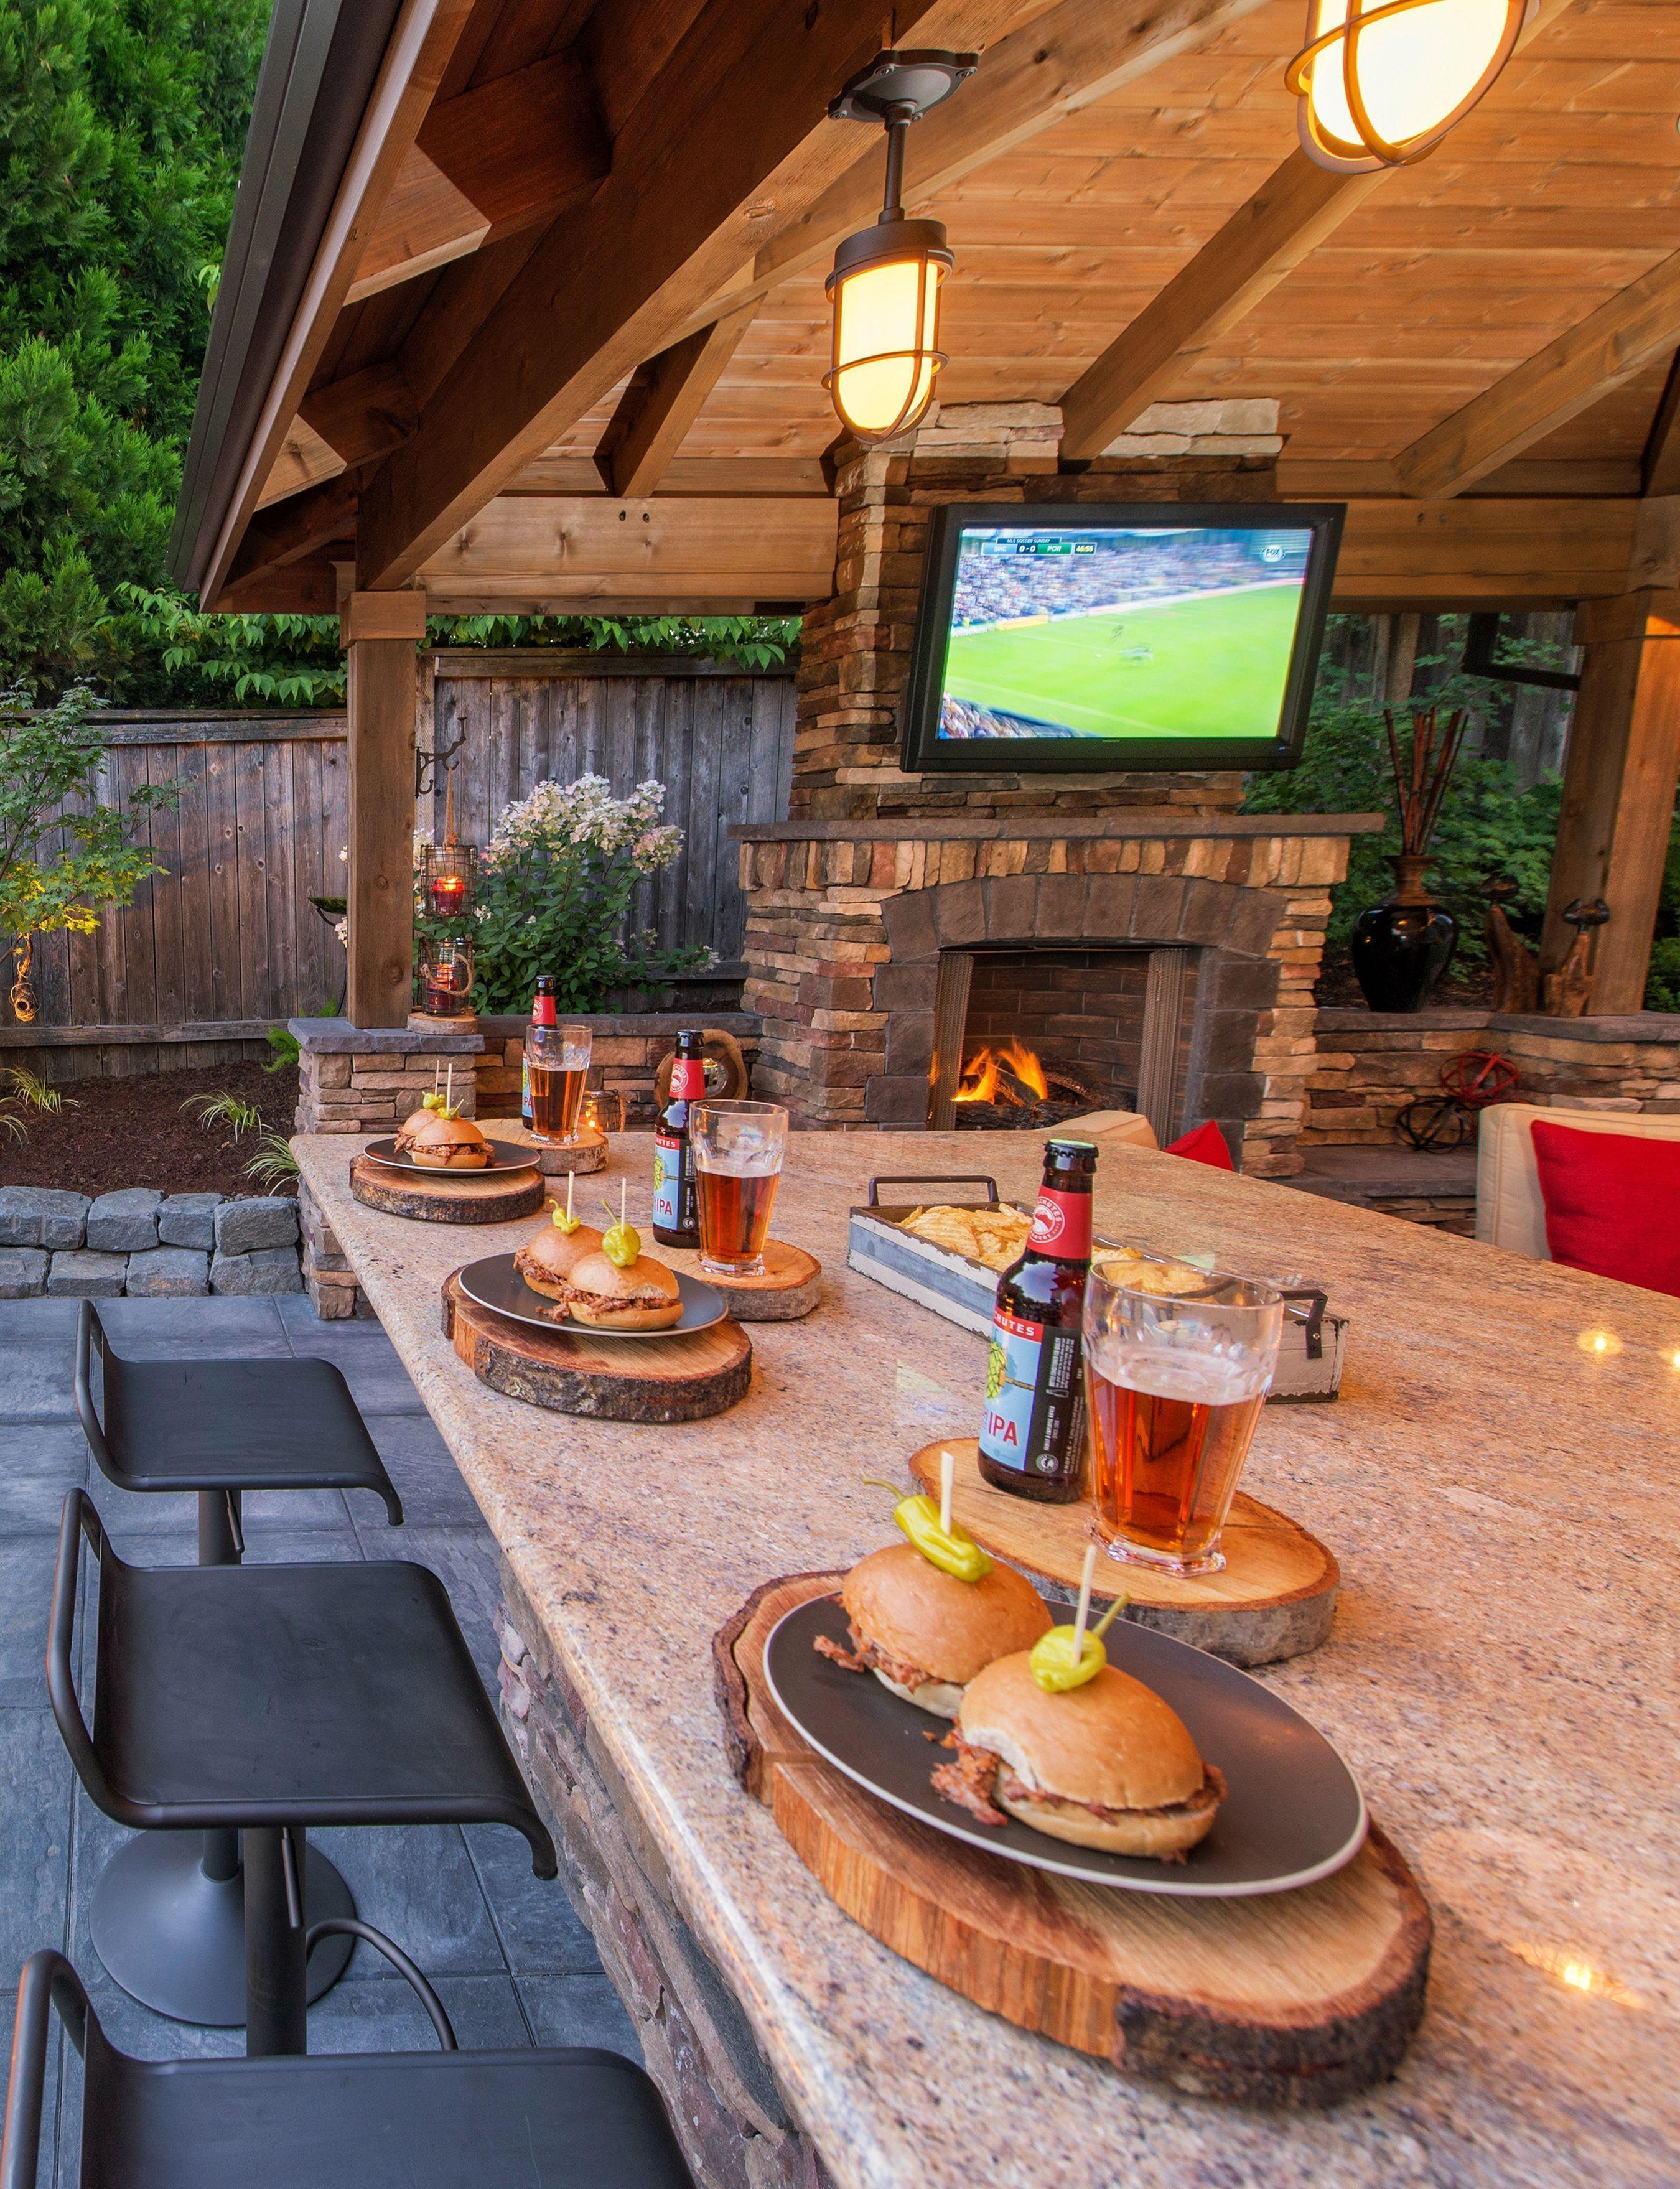 outdoor kitchen ideas - photos of outdoor kitchens. browse photos